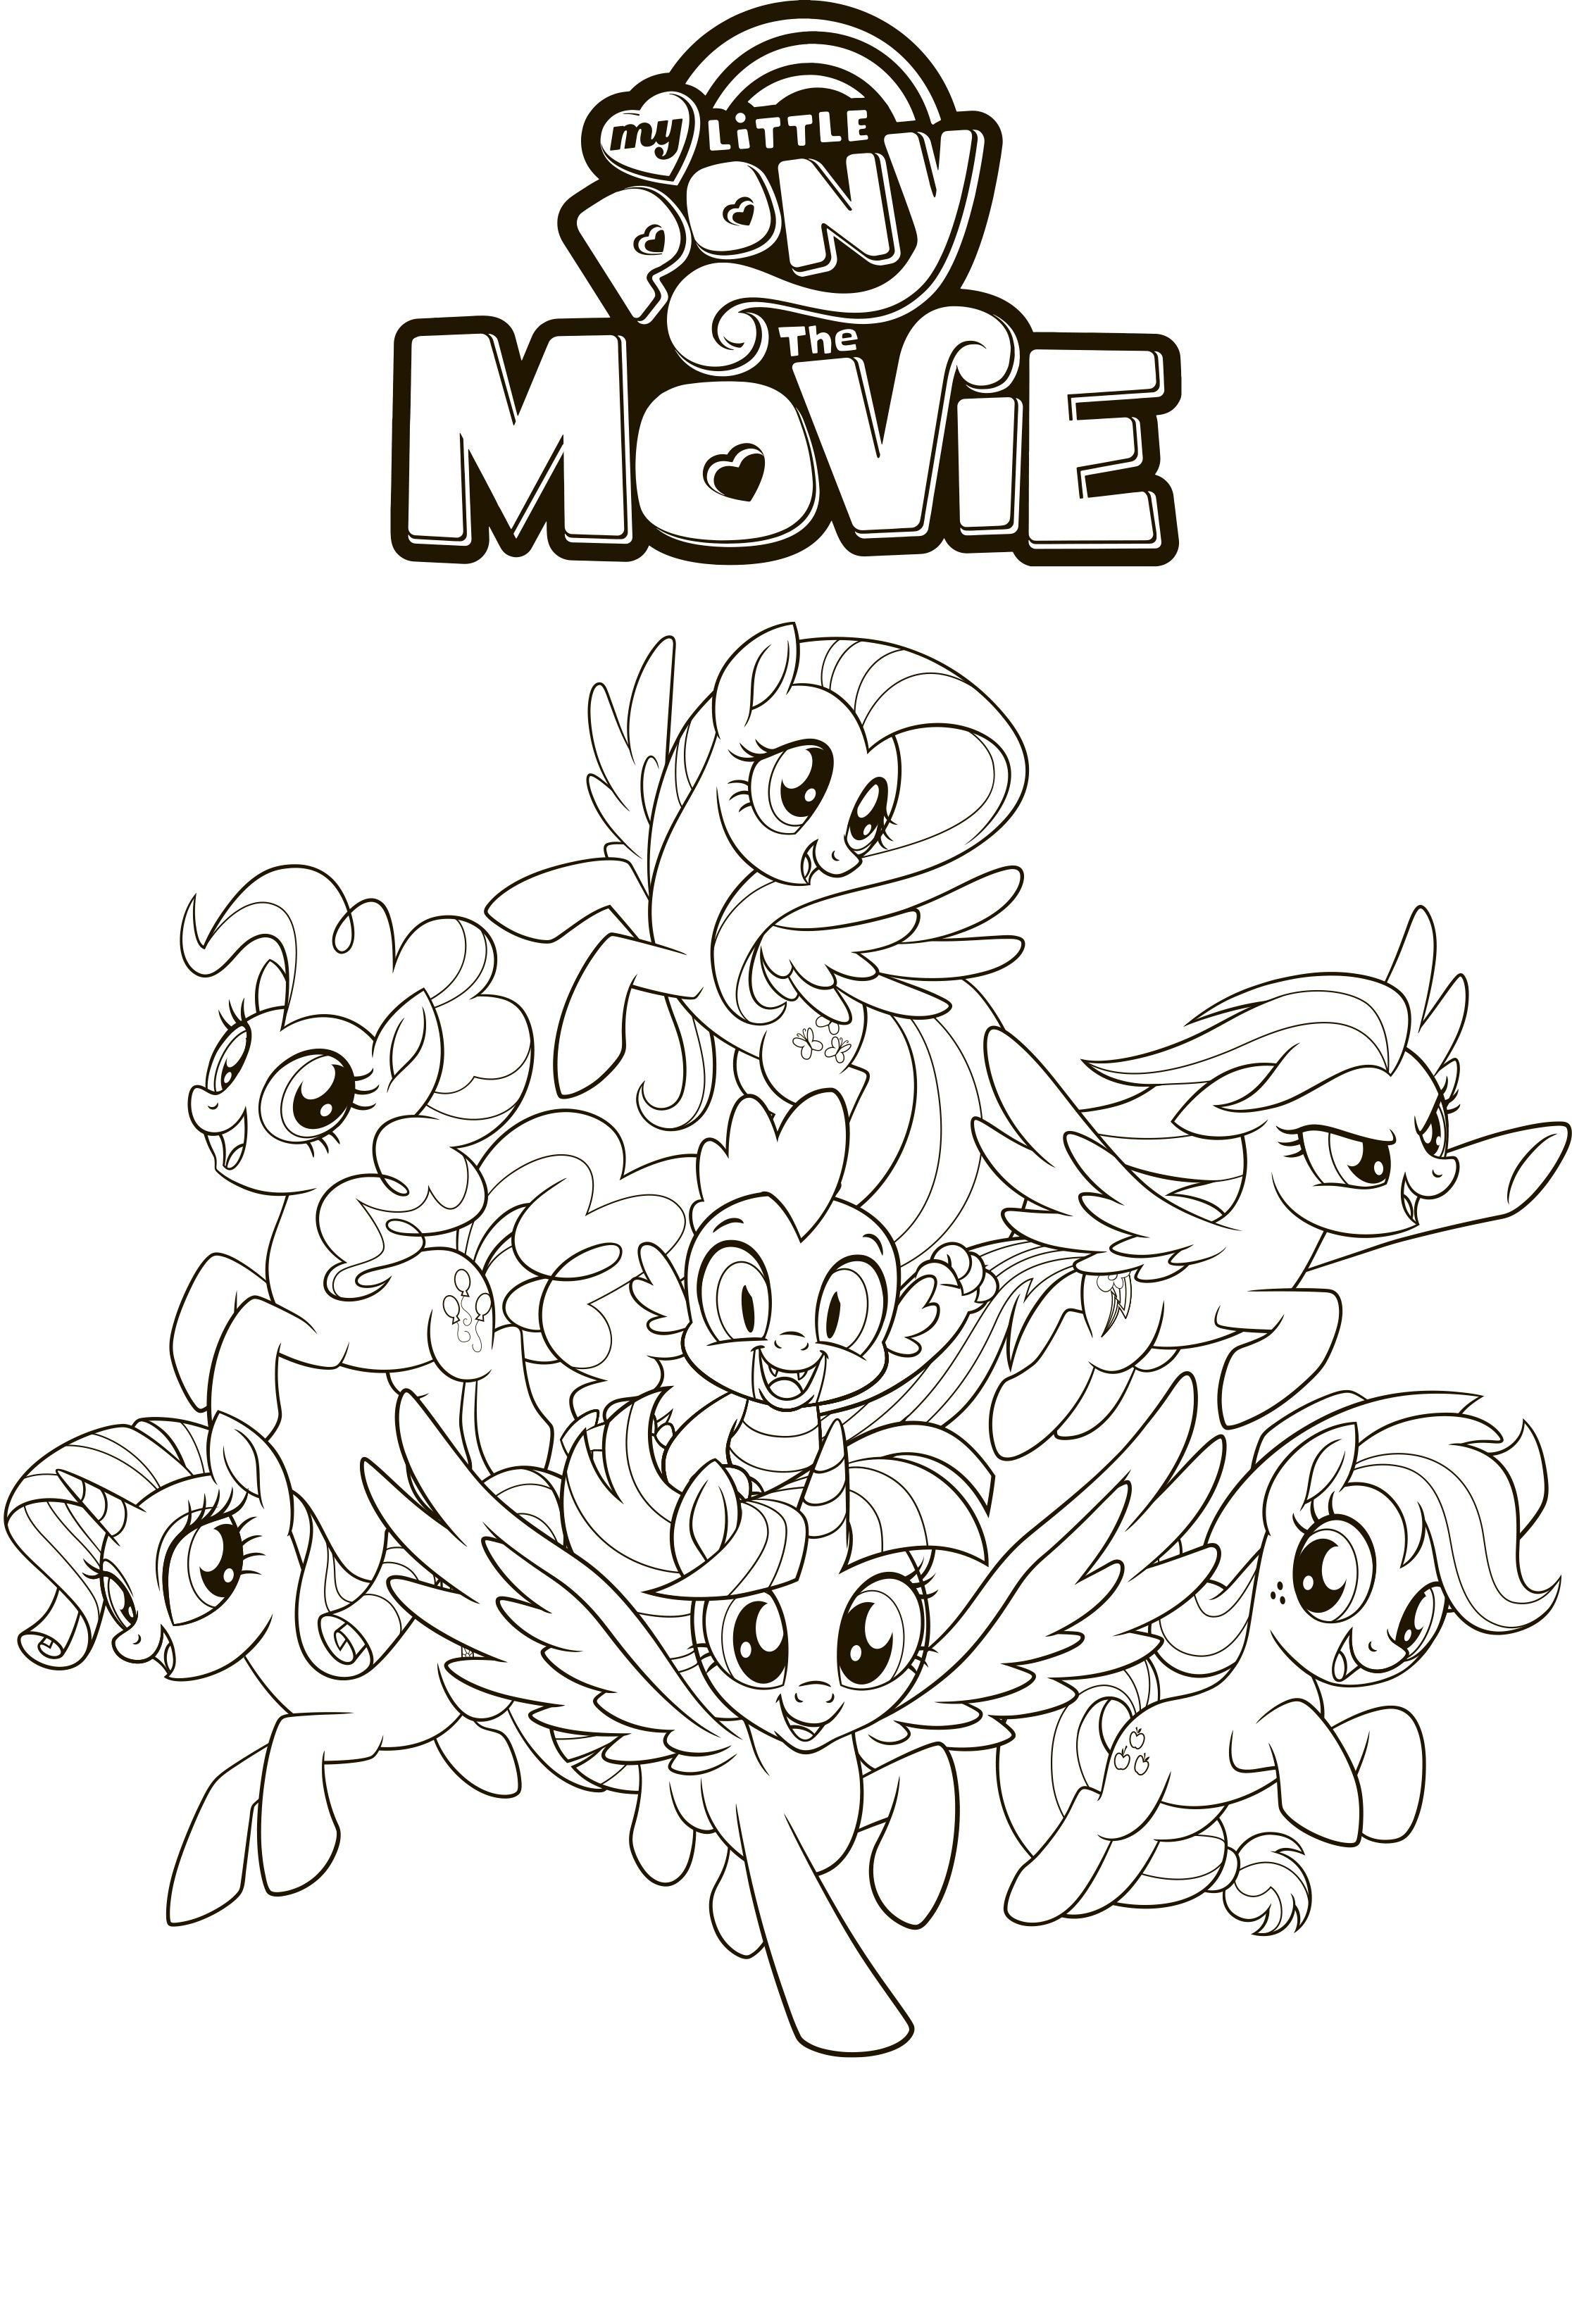 Rainbow Dash Princess Celestia Pinkie Pie Movie Fluttershy Equestria Girl My Little Pony Coloring My Little Pony Movie My Little Pony Characters